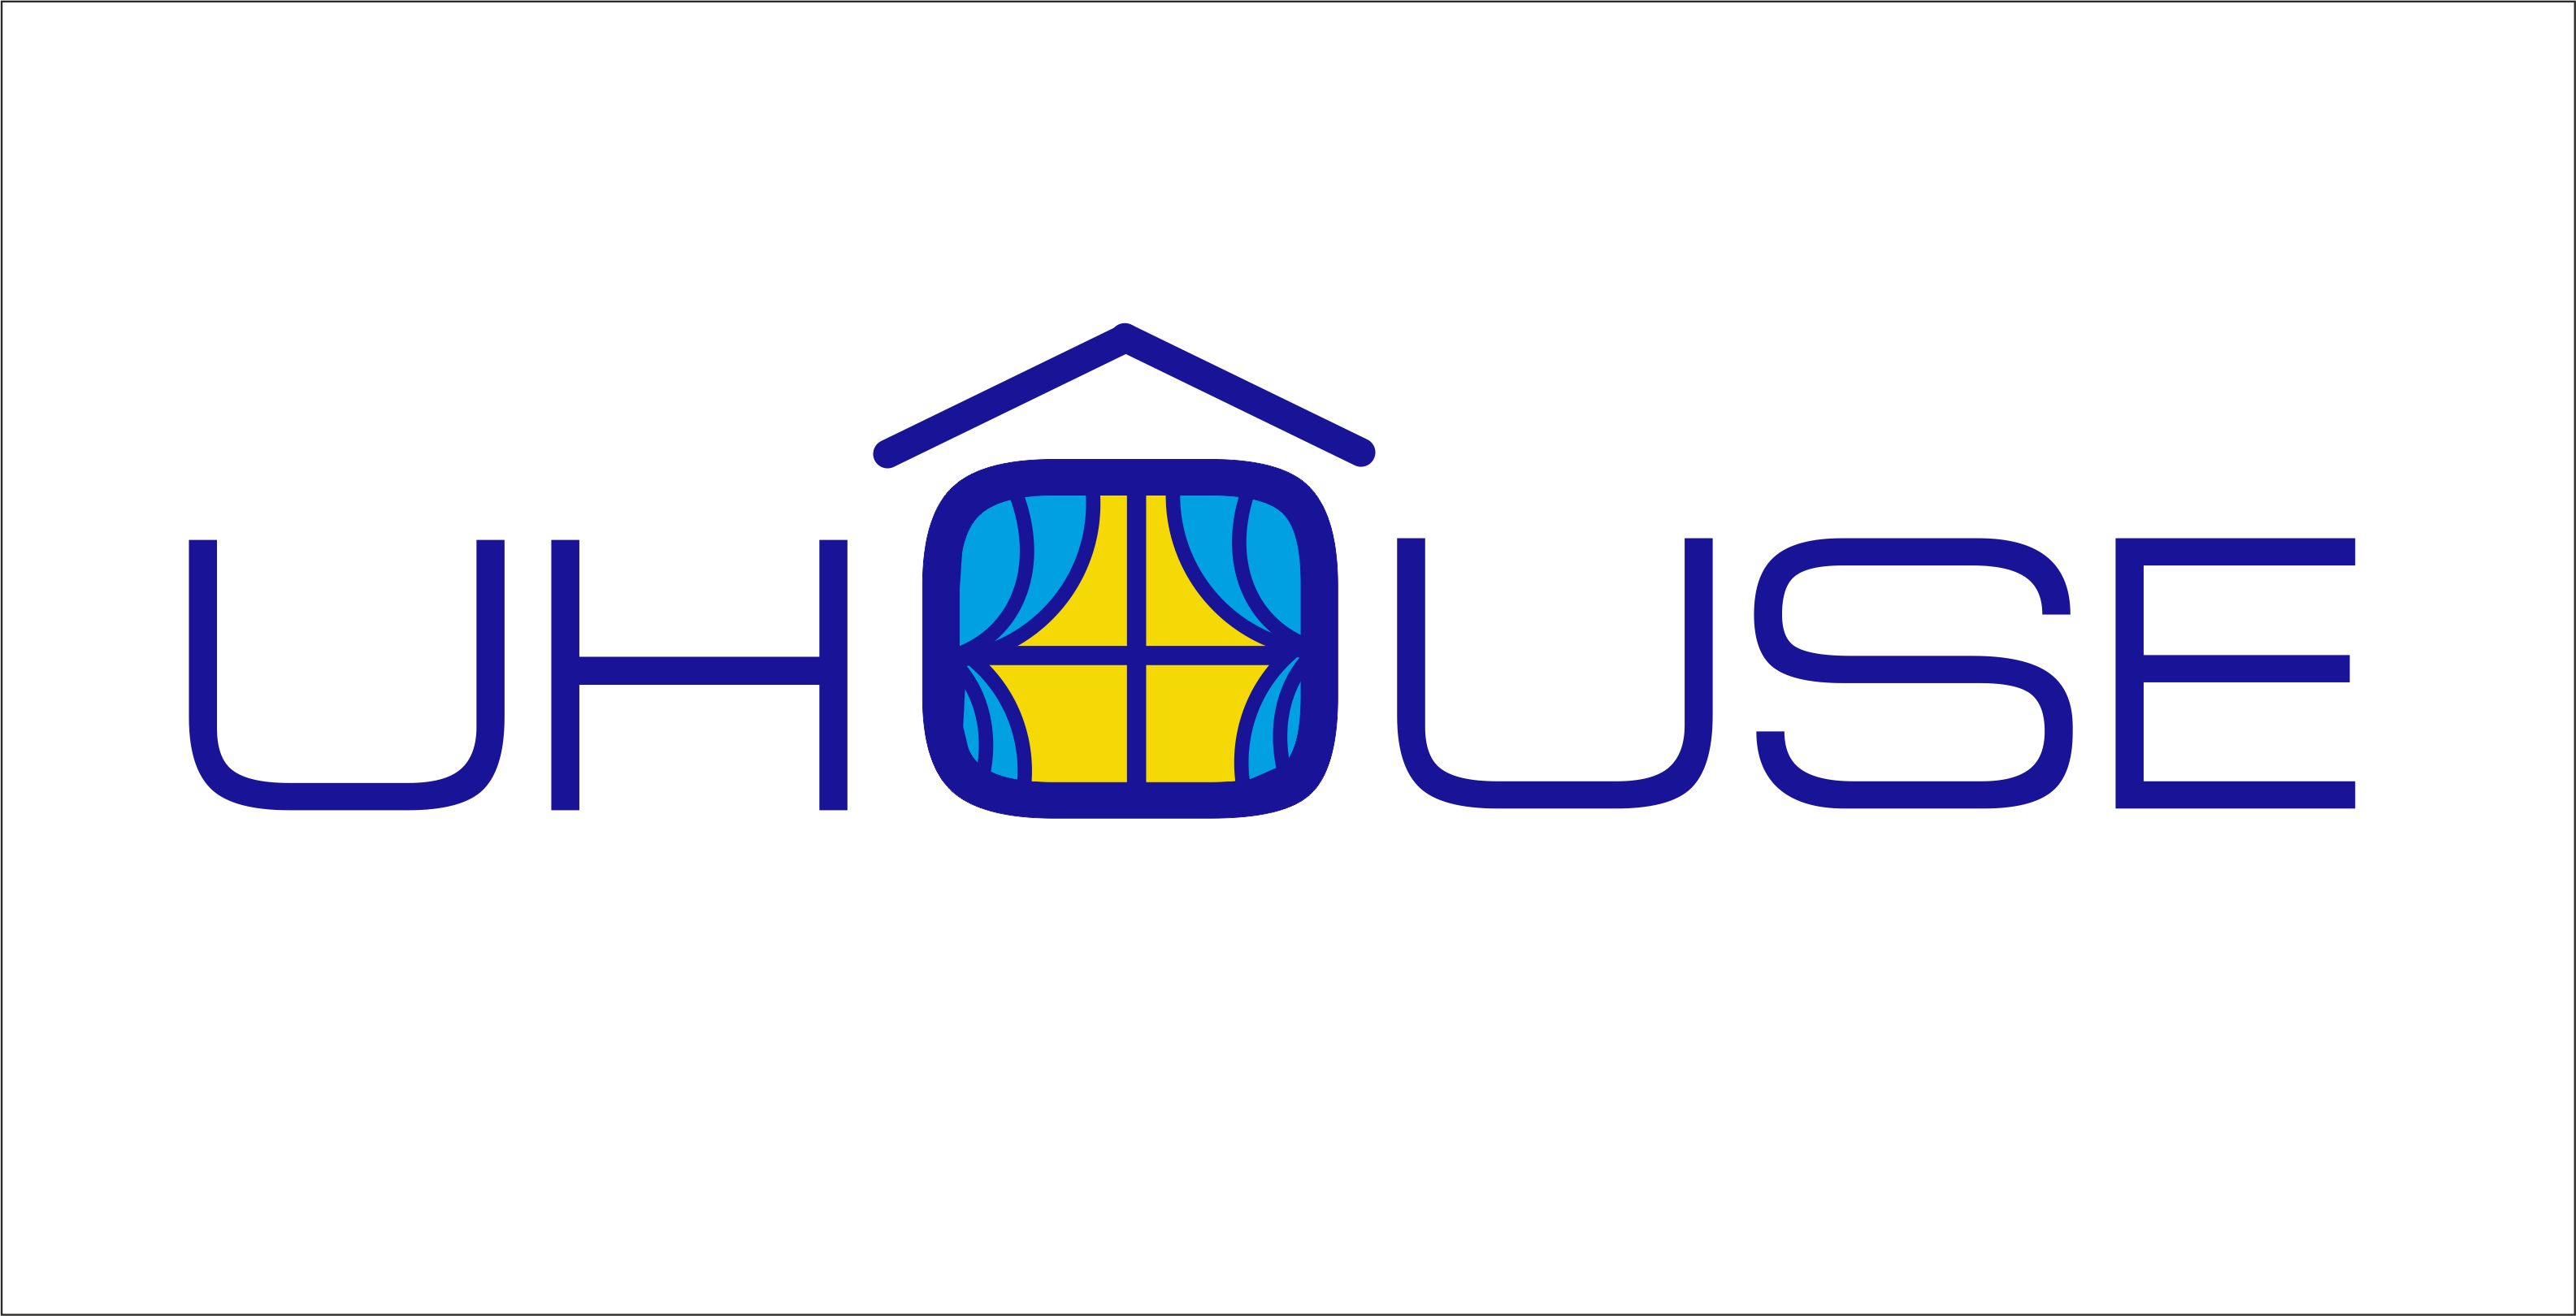 Создаем Лого для Интерьер портала фото f_9125152dabbe7936.jpg